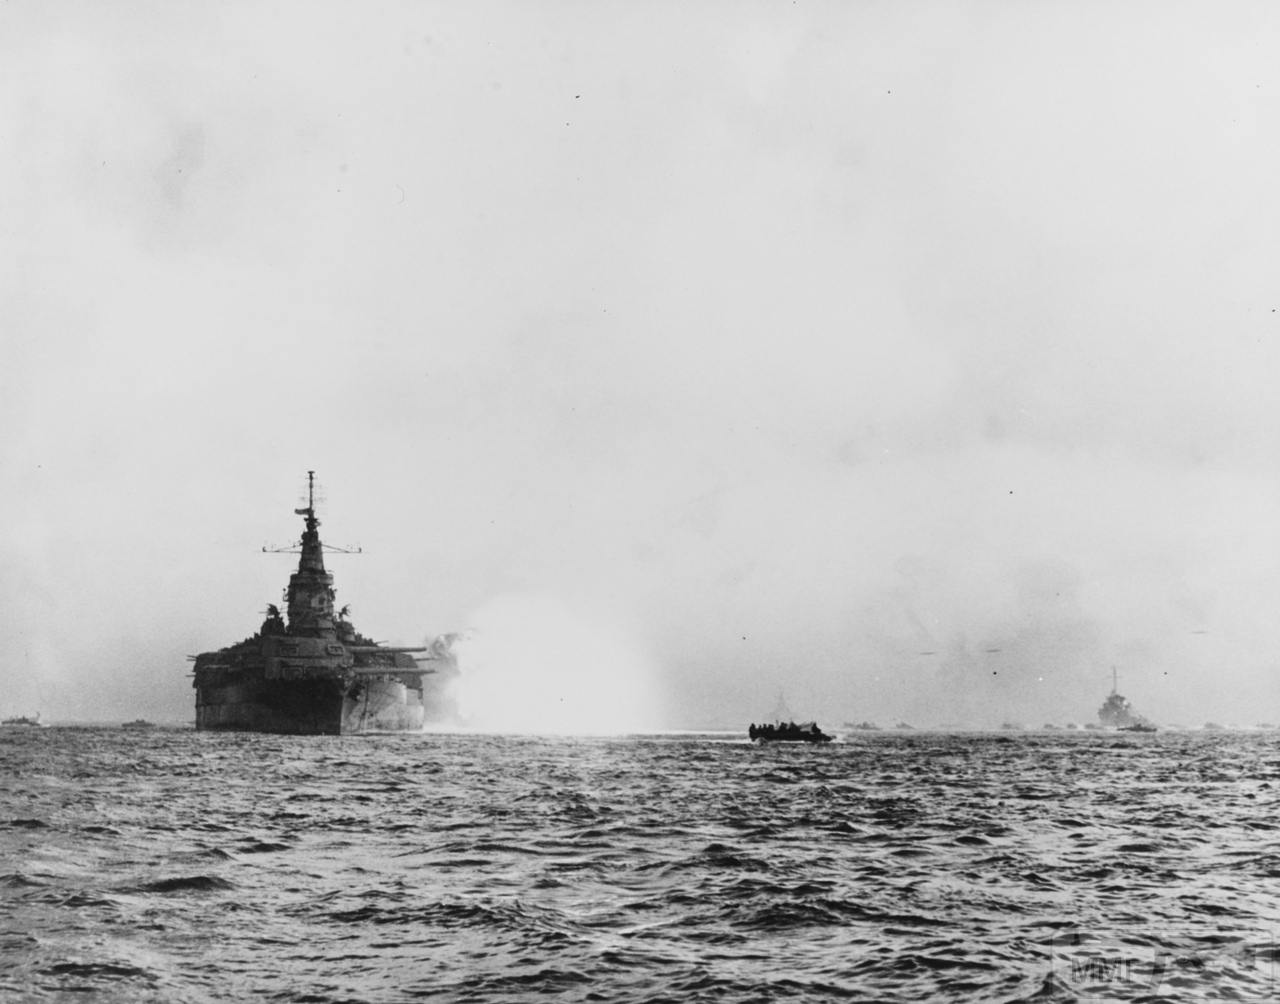 49470 - USS Tennessee (BB-43)